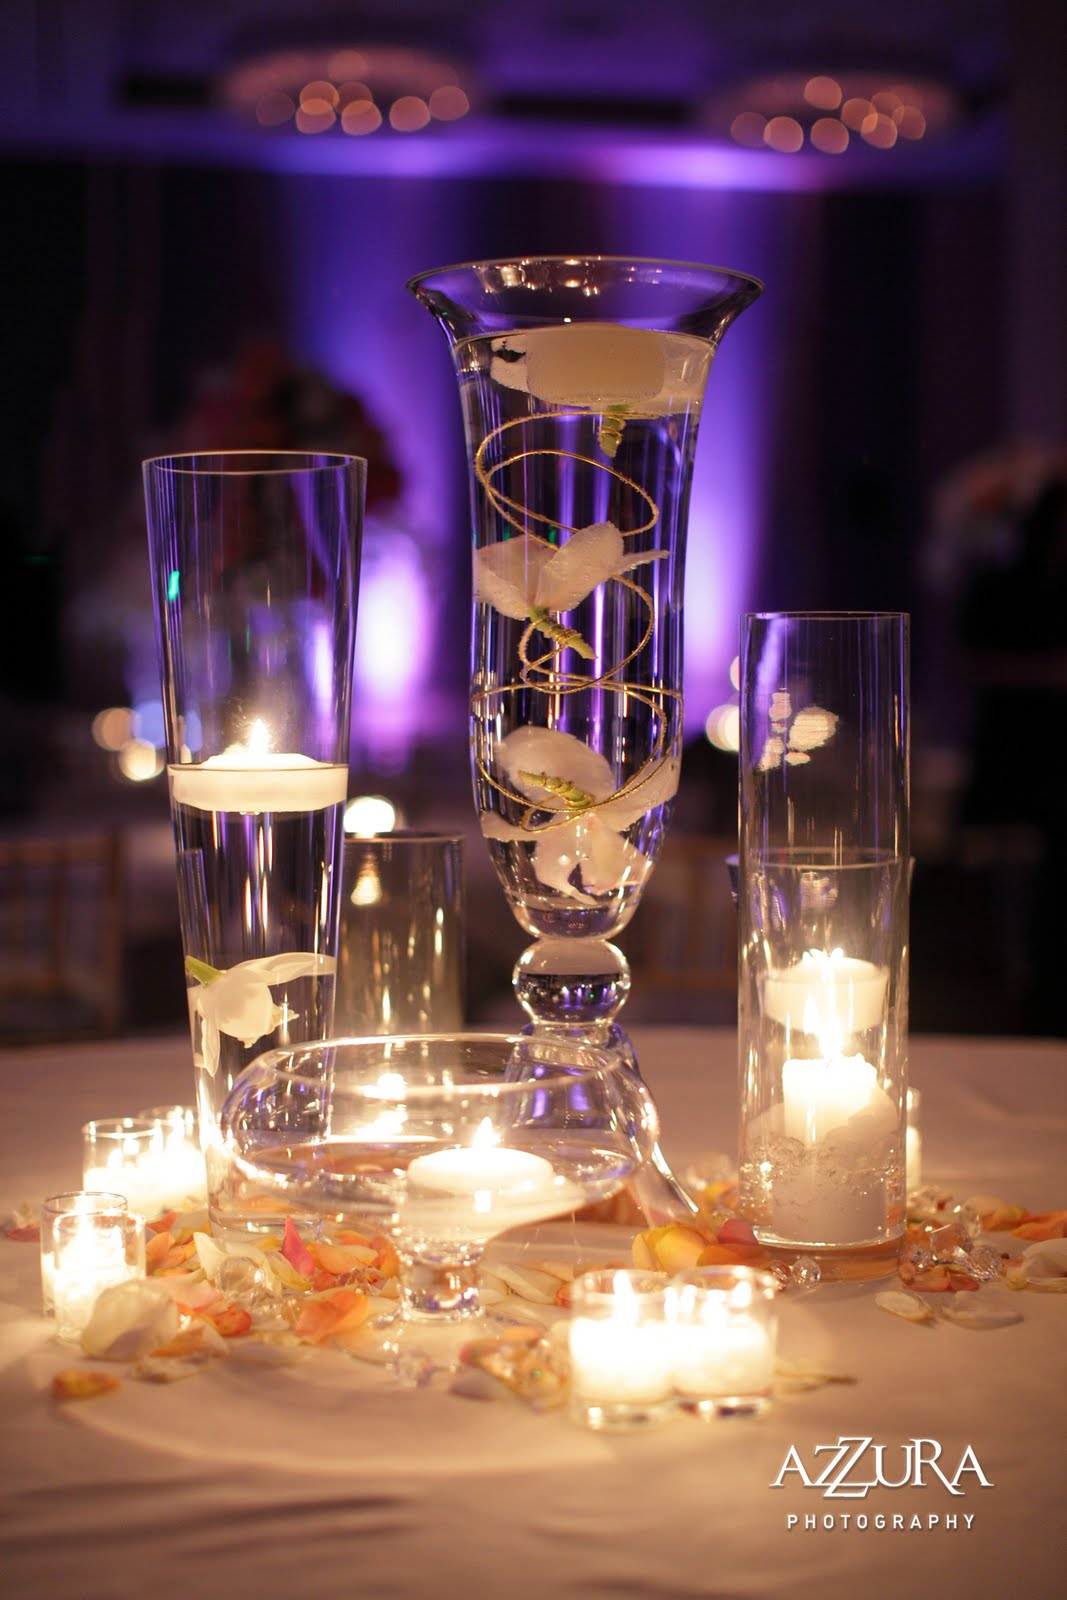 Flora nova design the blog amazing real wedding for Candle centerpieces for weddings ideas